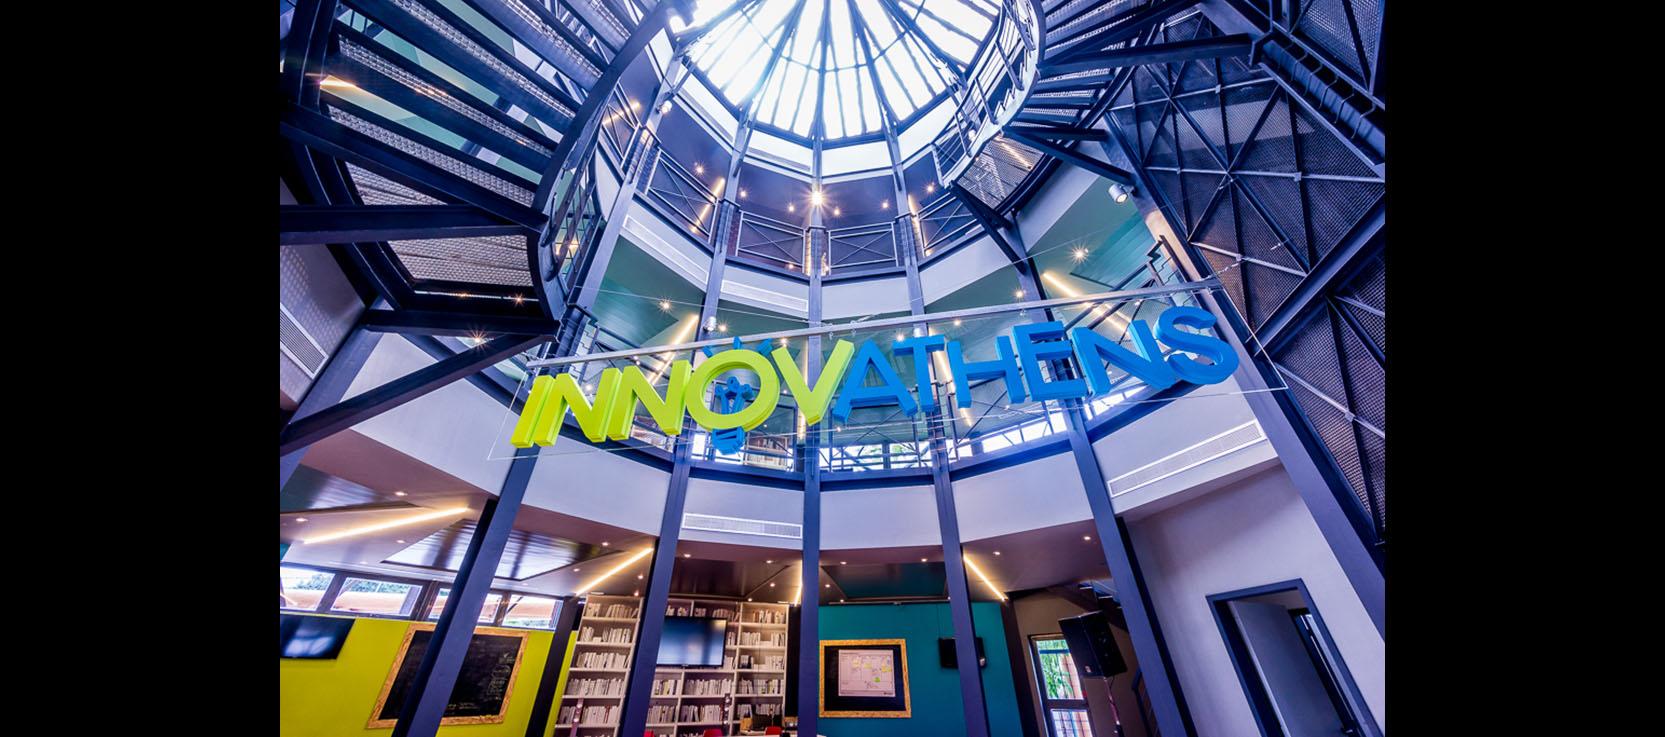 innovathens, architecture, design, innovation, domon, architects, consultants